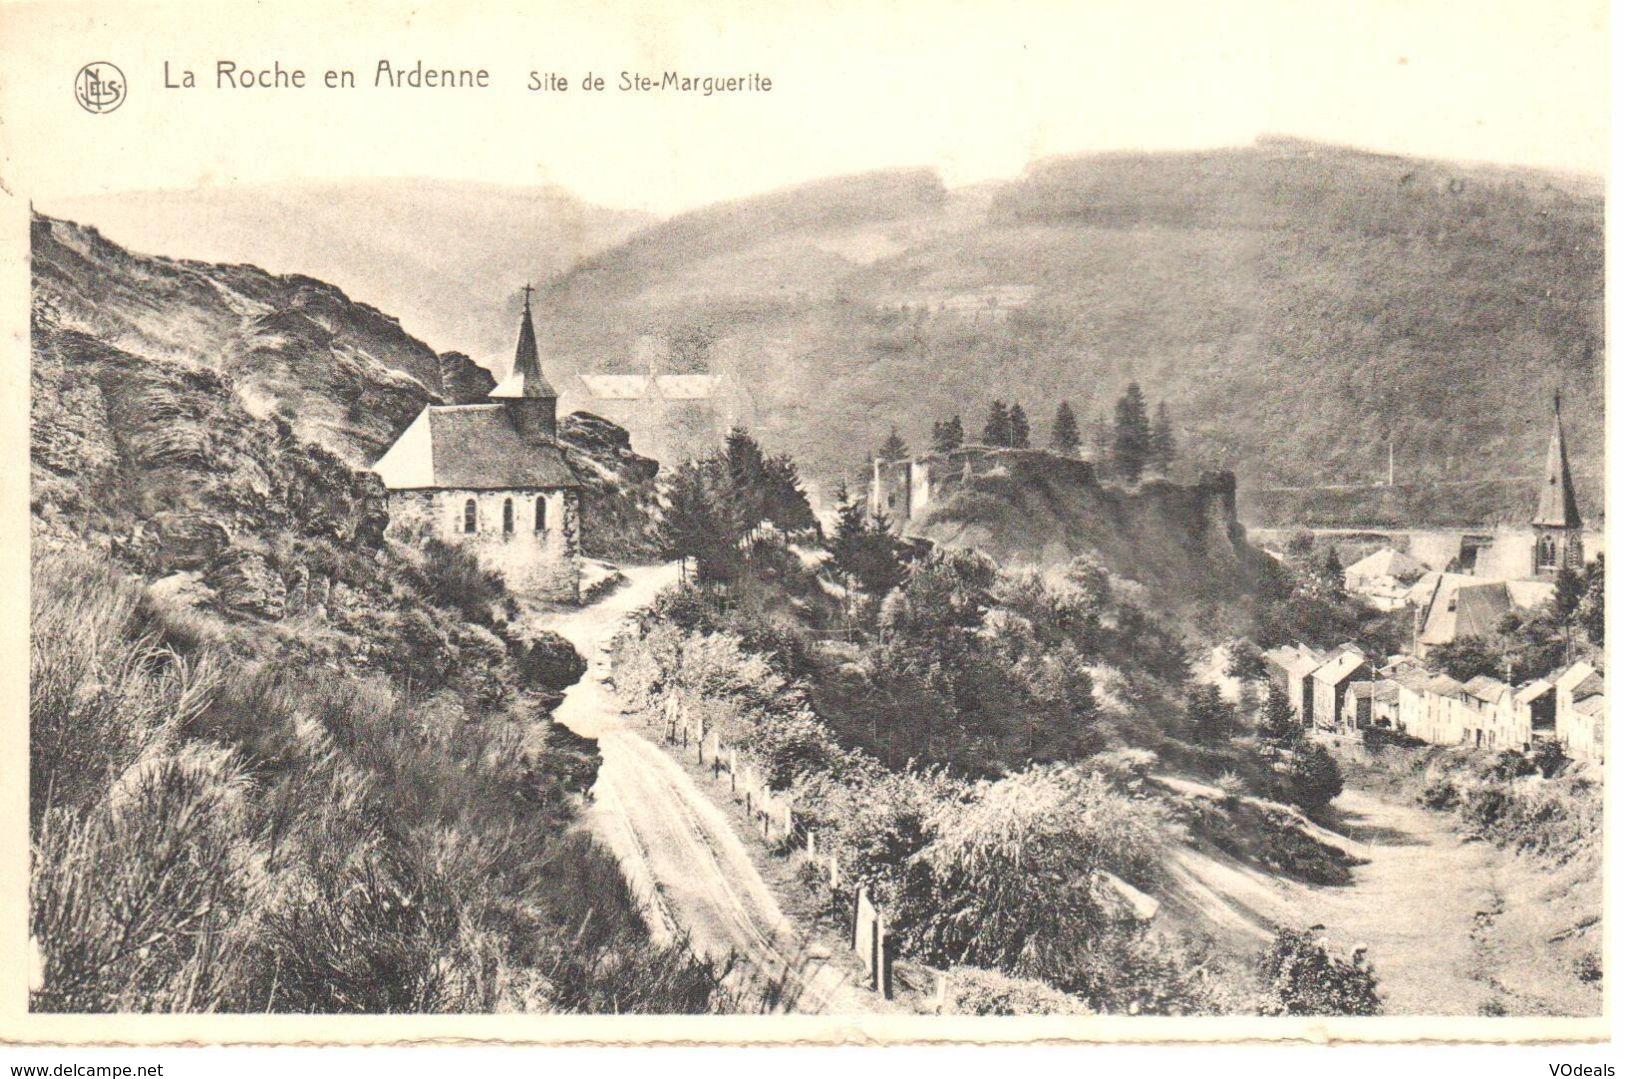 La-Roche-en-Ardenne - CPA - Site De Sainte Marguerite - La-Roche-en-Ardenne